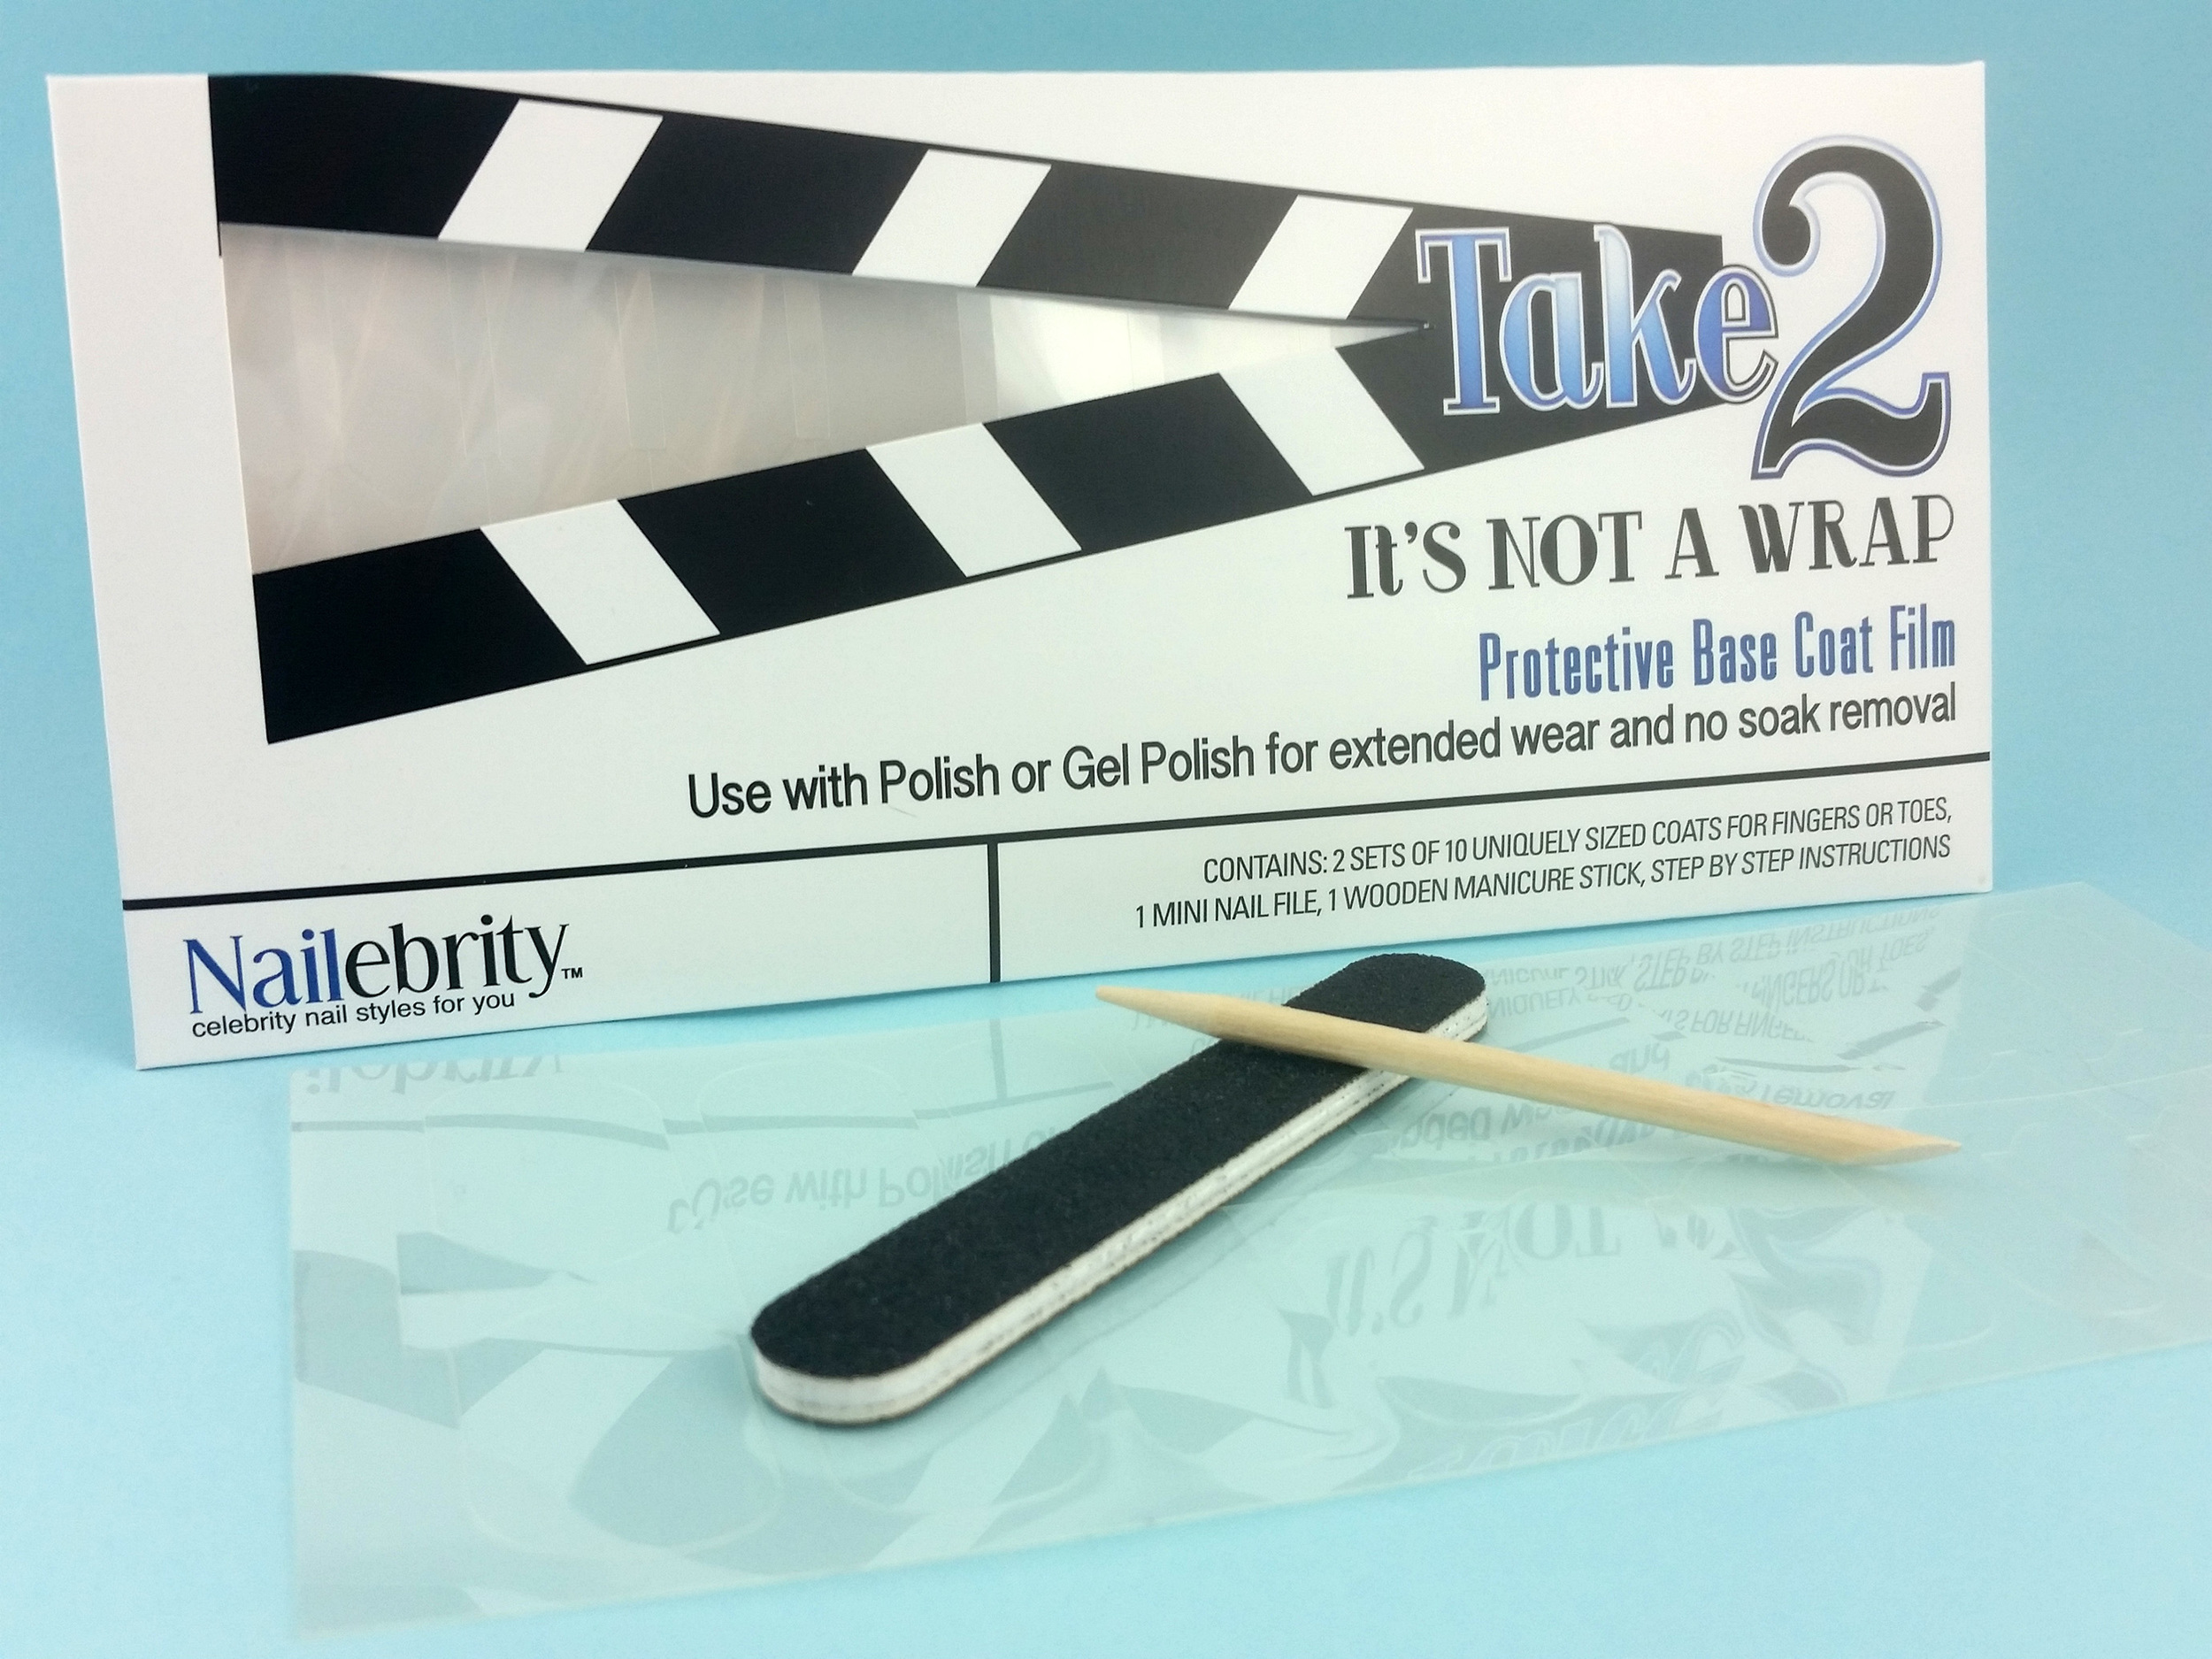 Nailebrity Take2 It's Not a Wrap! Base Coat Film